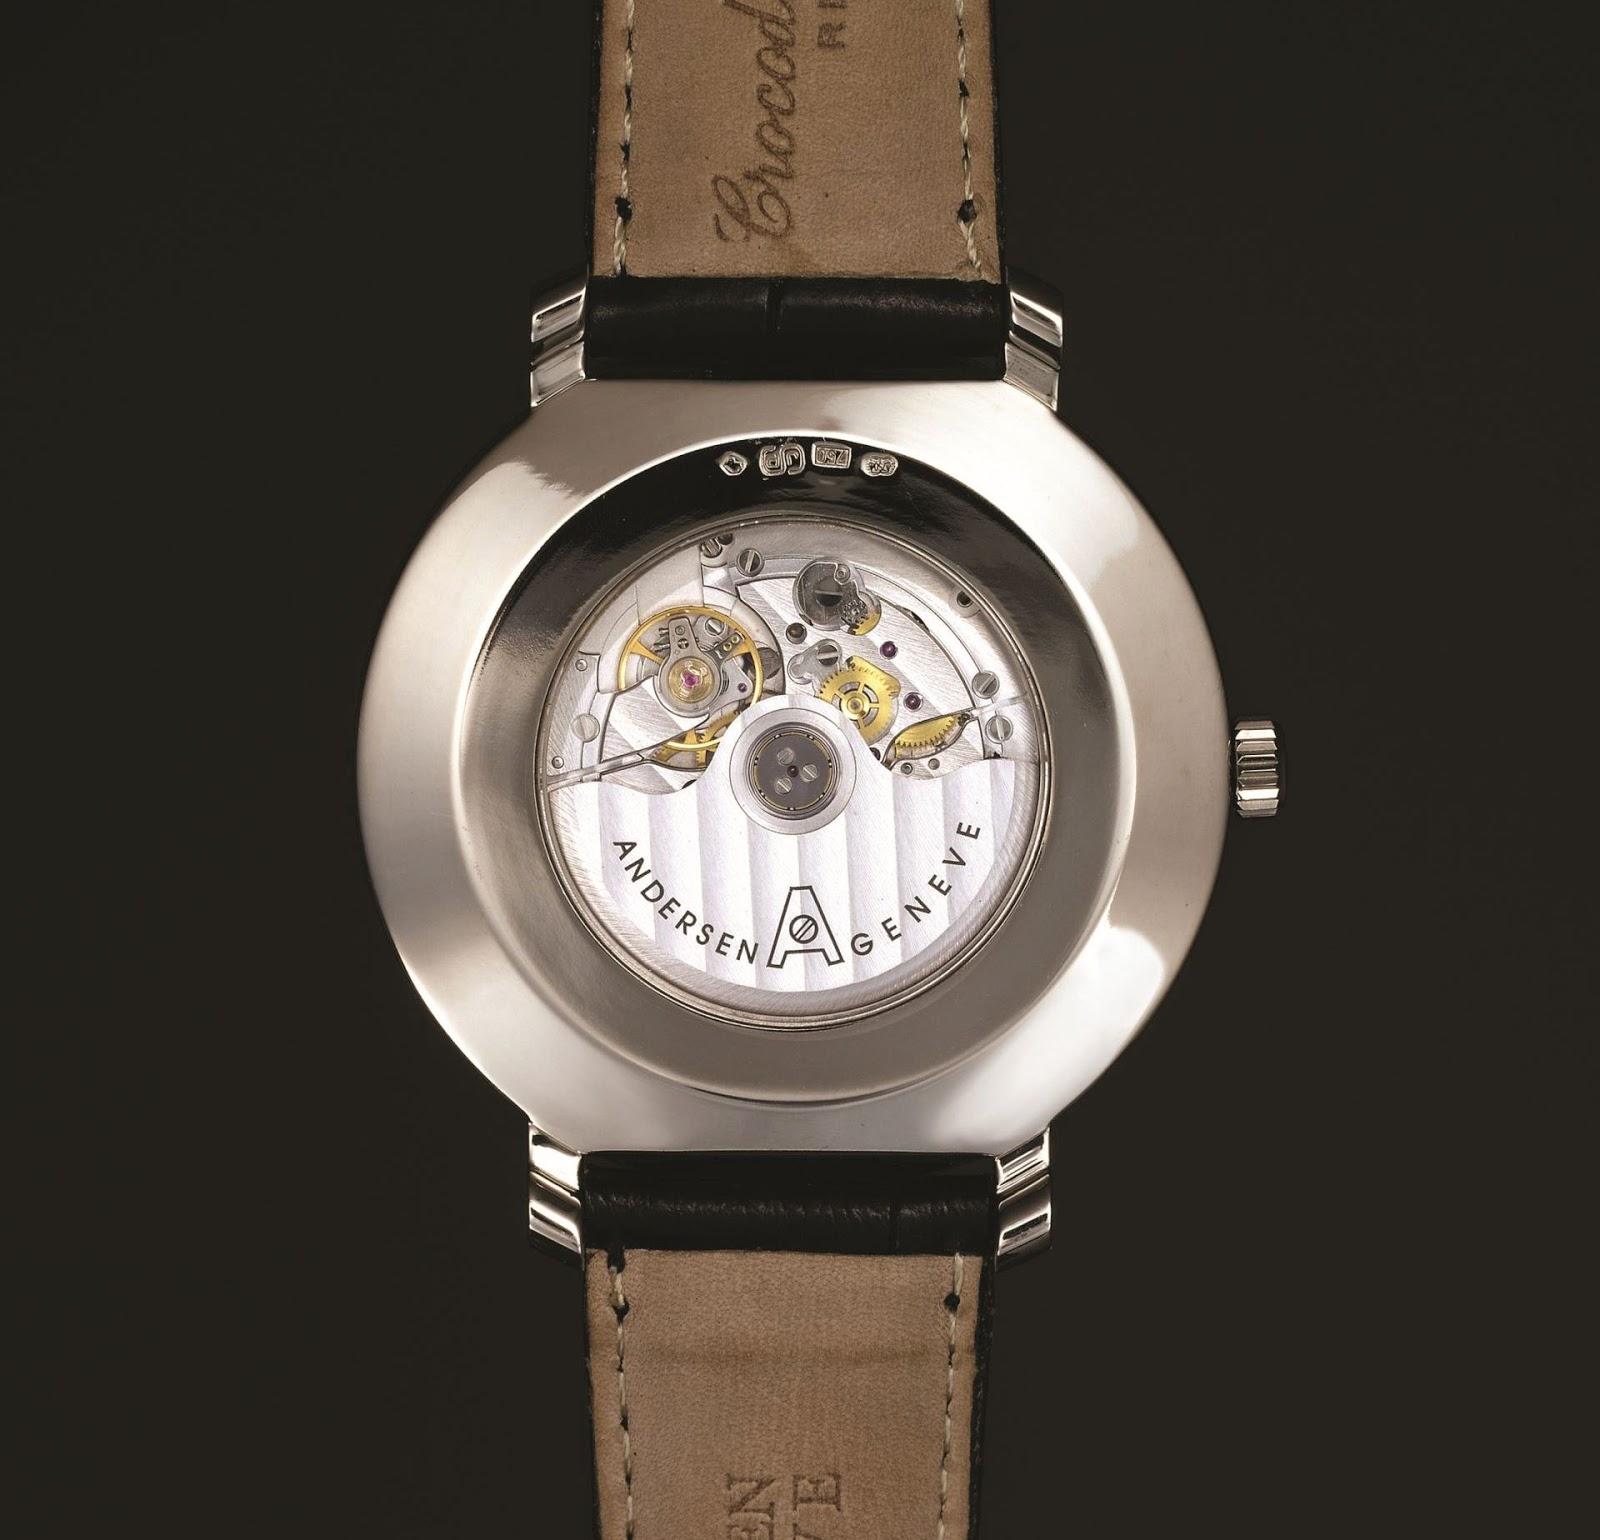 Anderesen Geneve Kamar - Classic Moonphase Watch caseback view